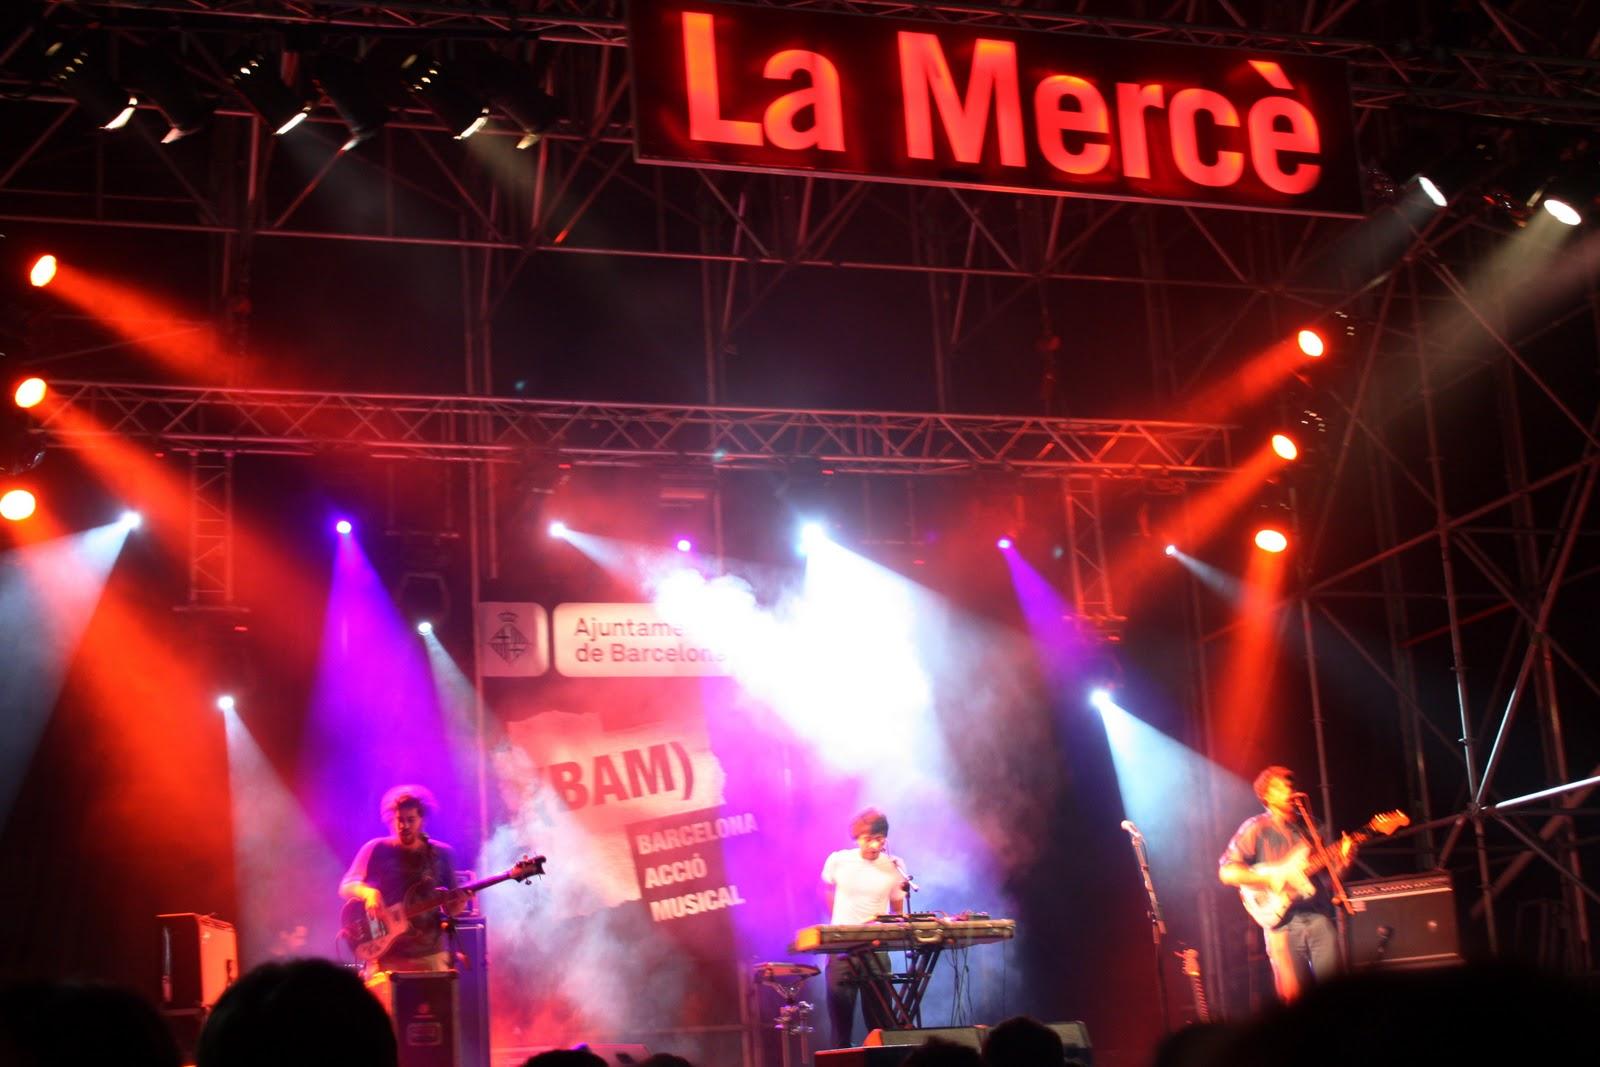 Bam Concerts La Merce Barcelona